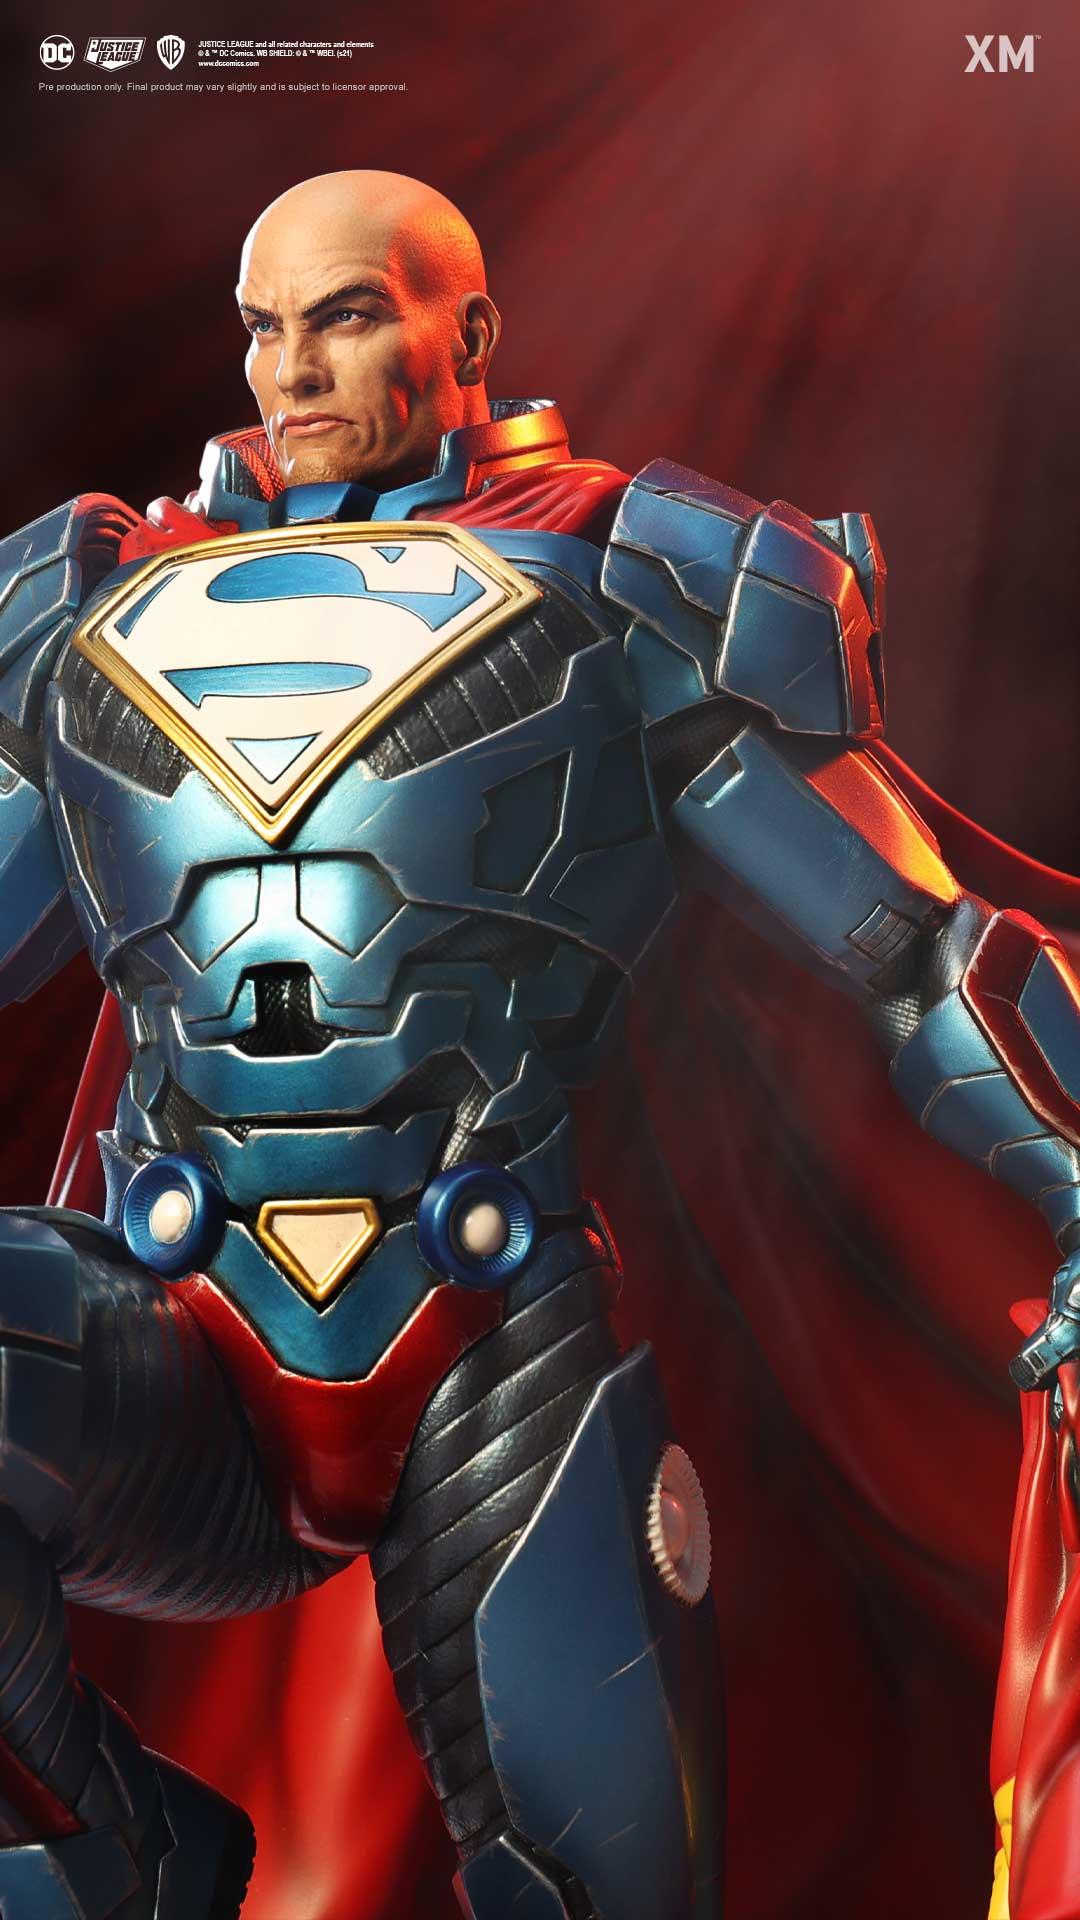 Link a Xm Studios_Lex_Luthor_Superman_DC- (19)